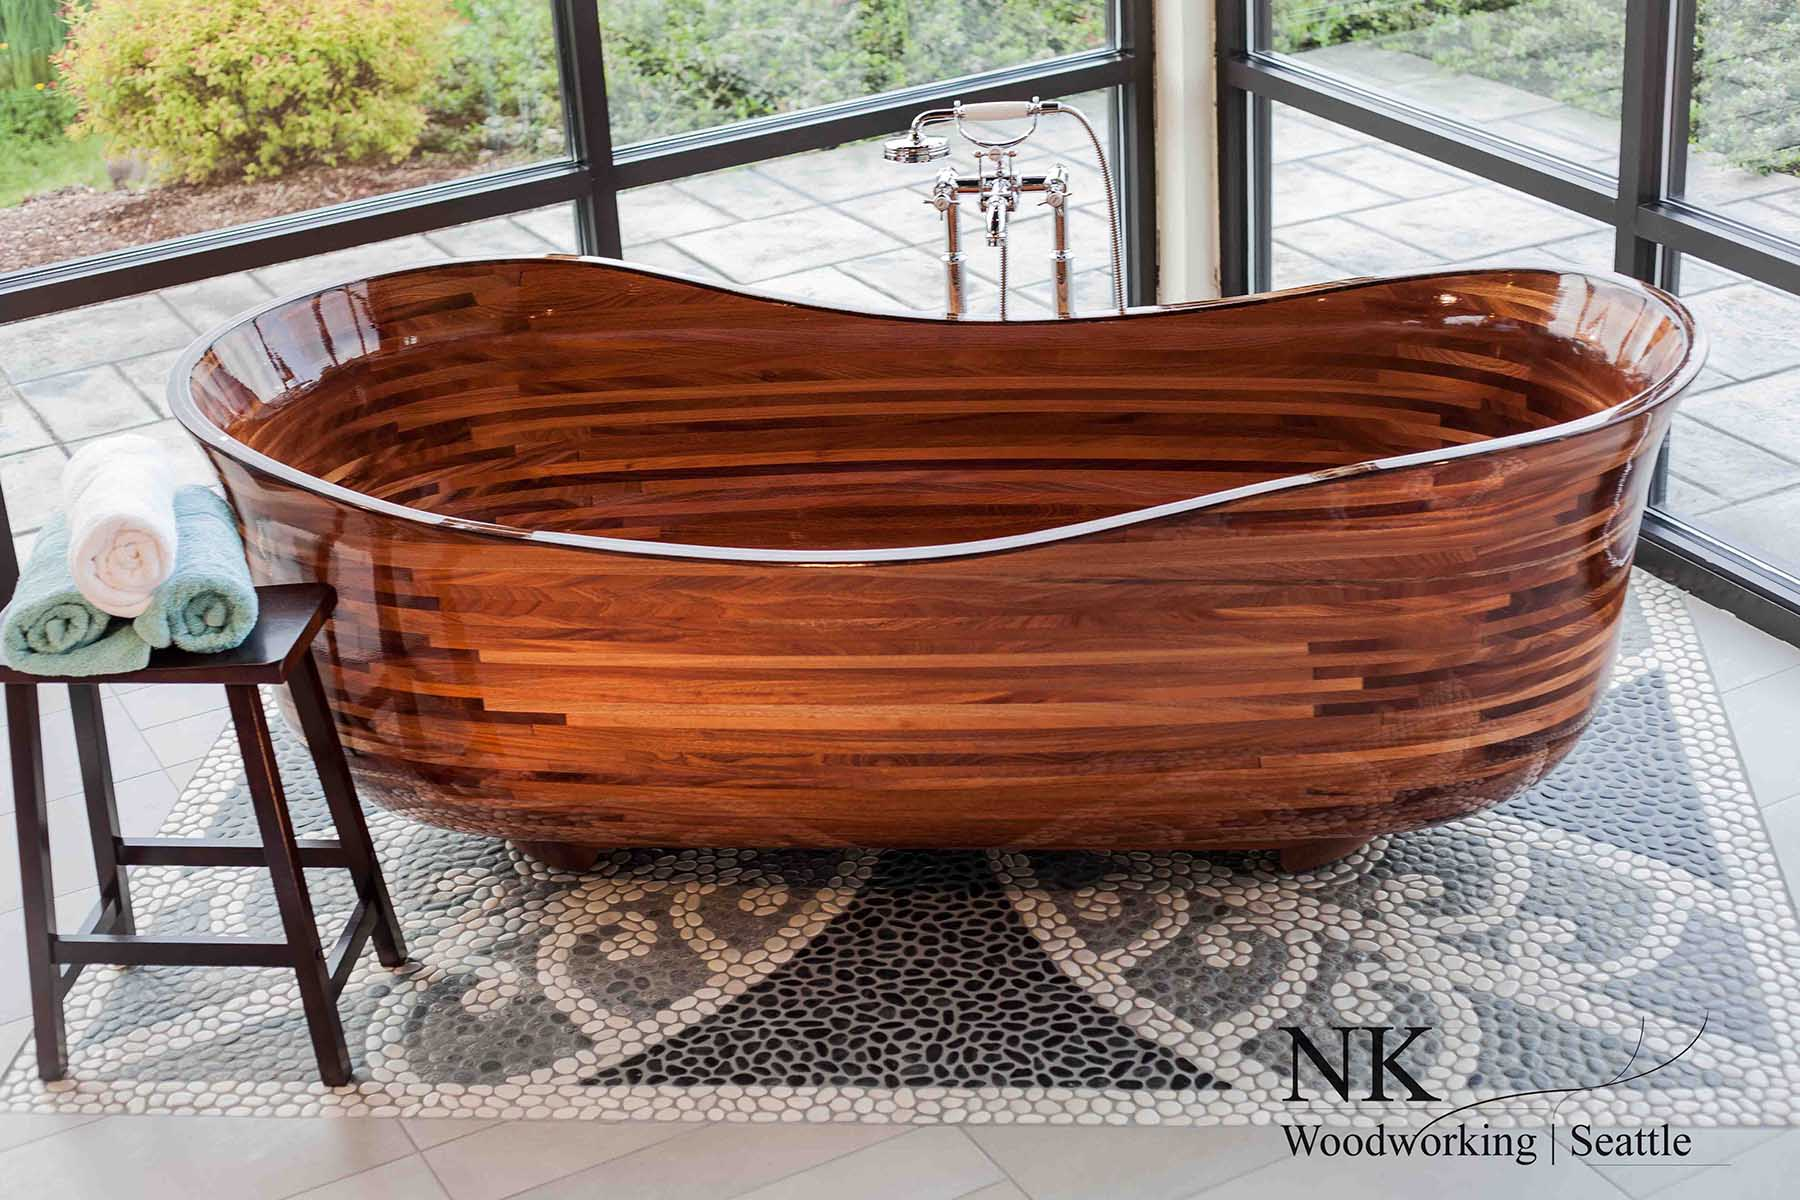 NK Woodworking Oval Tub.jpg